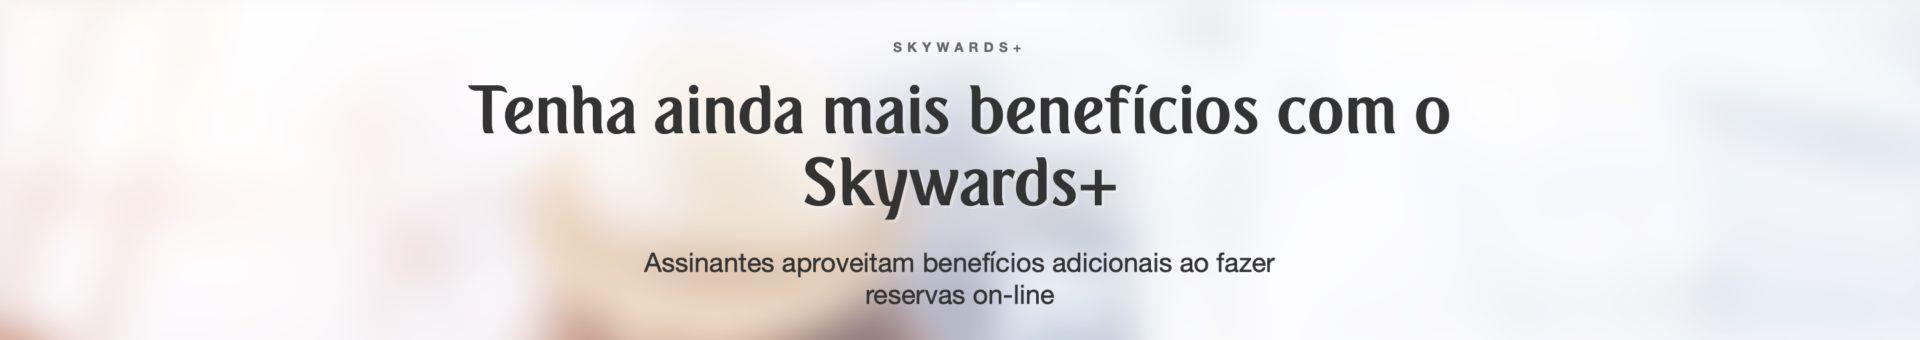 Emirates planos assinatura Skywards+